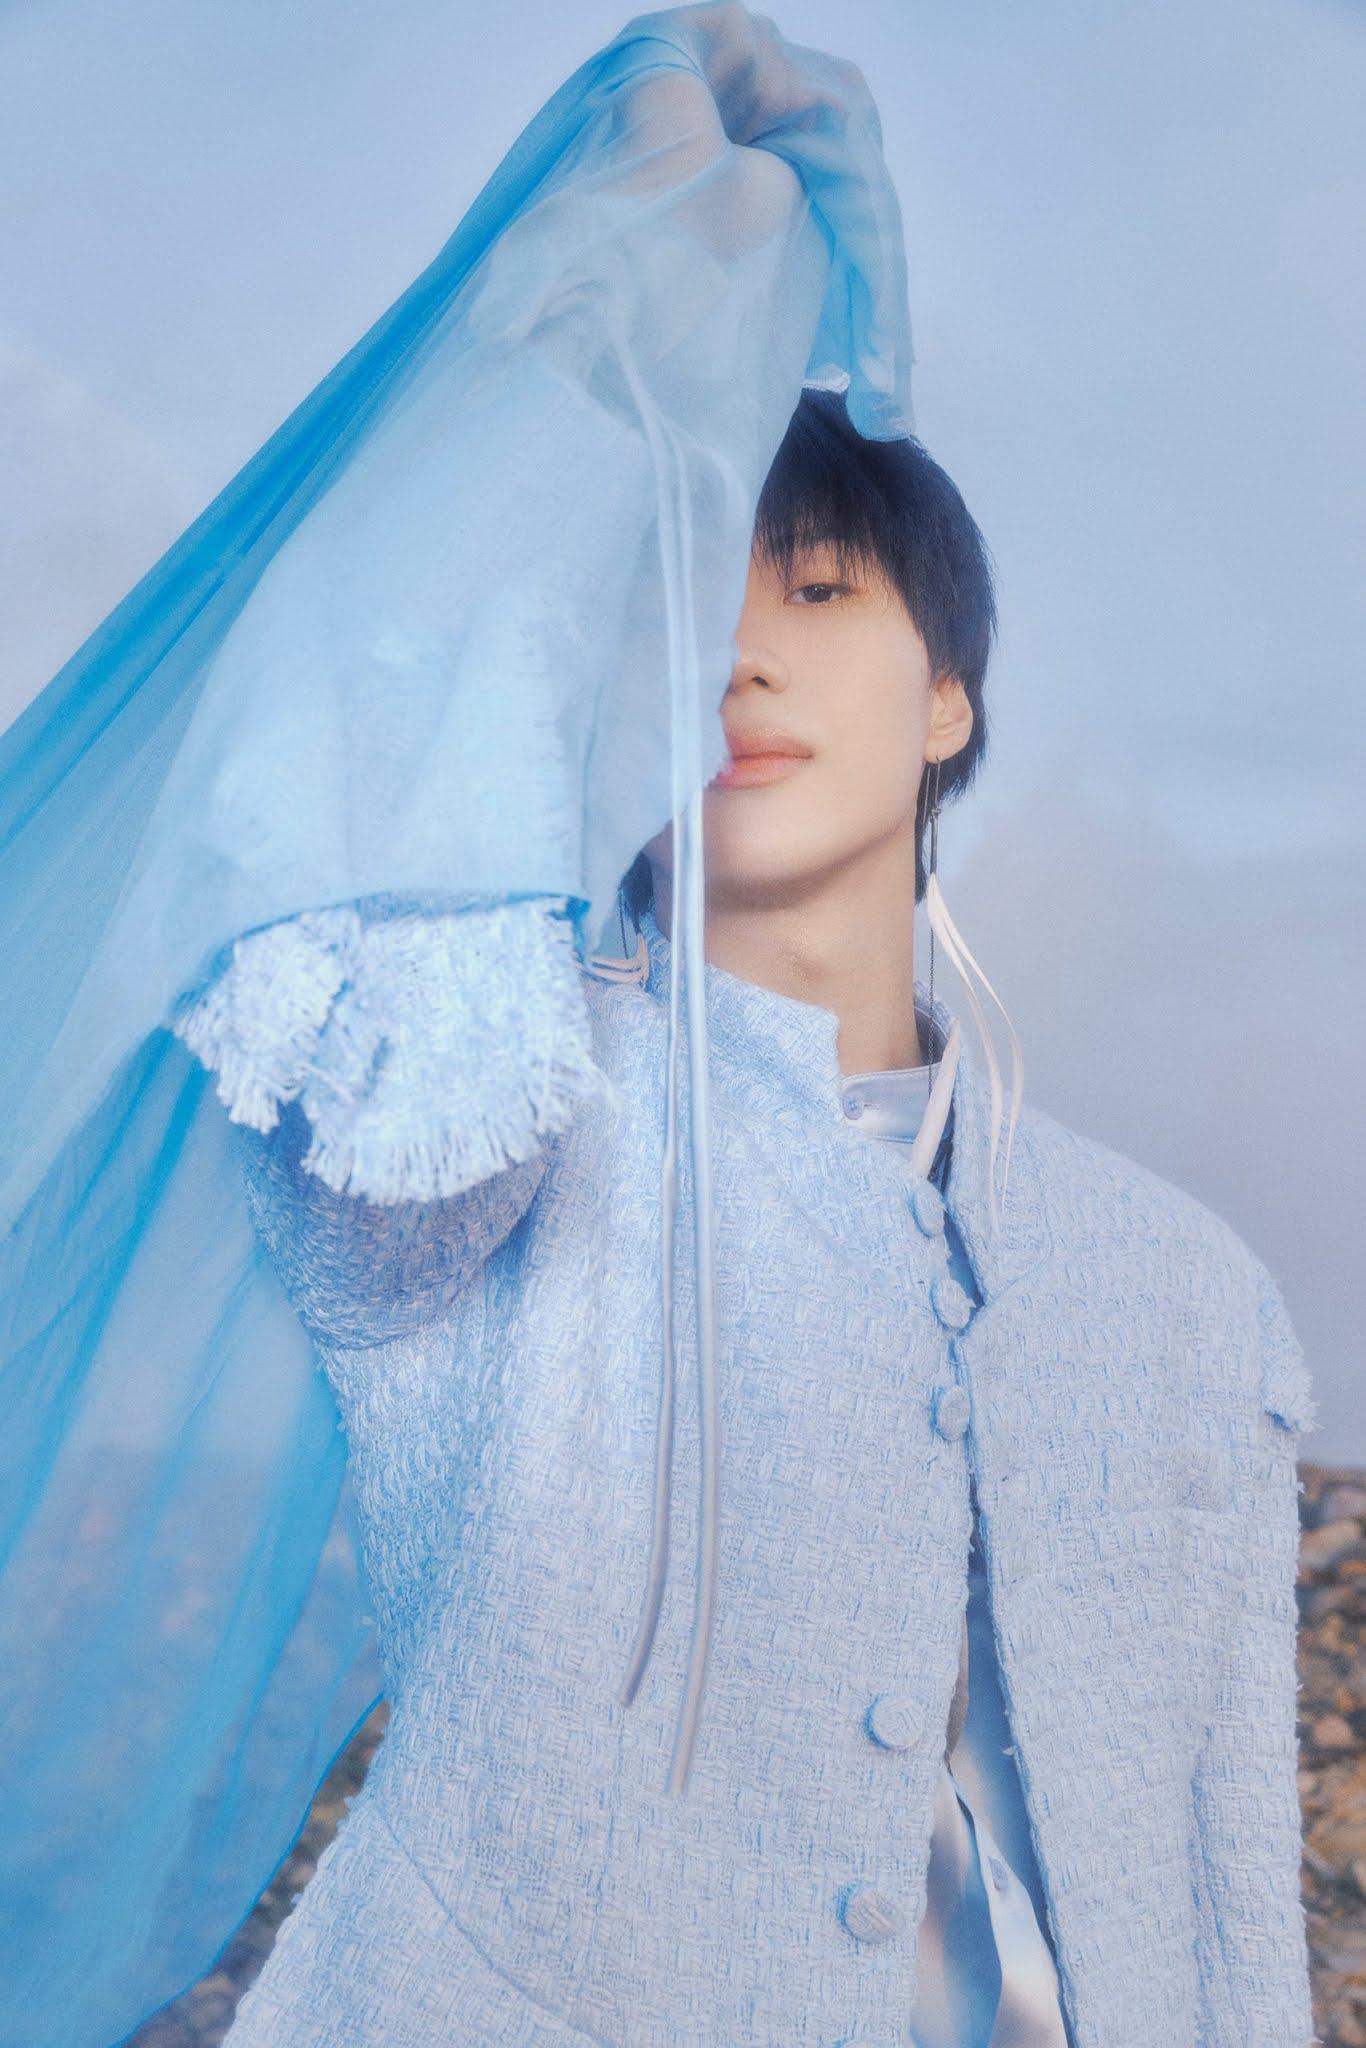 SHINee's Taemin Looks Gentle on Comeback Teaser Photo 'Never Gonna Dance Again: Act 2'